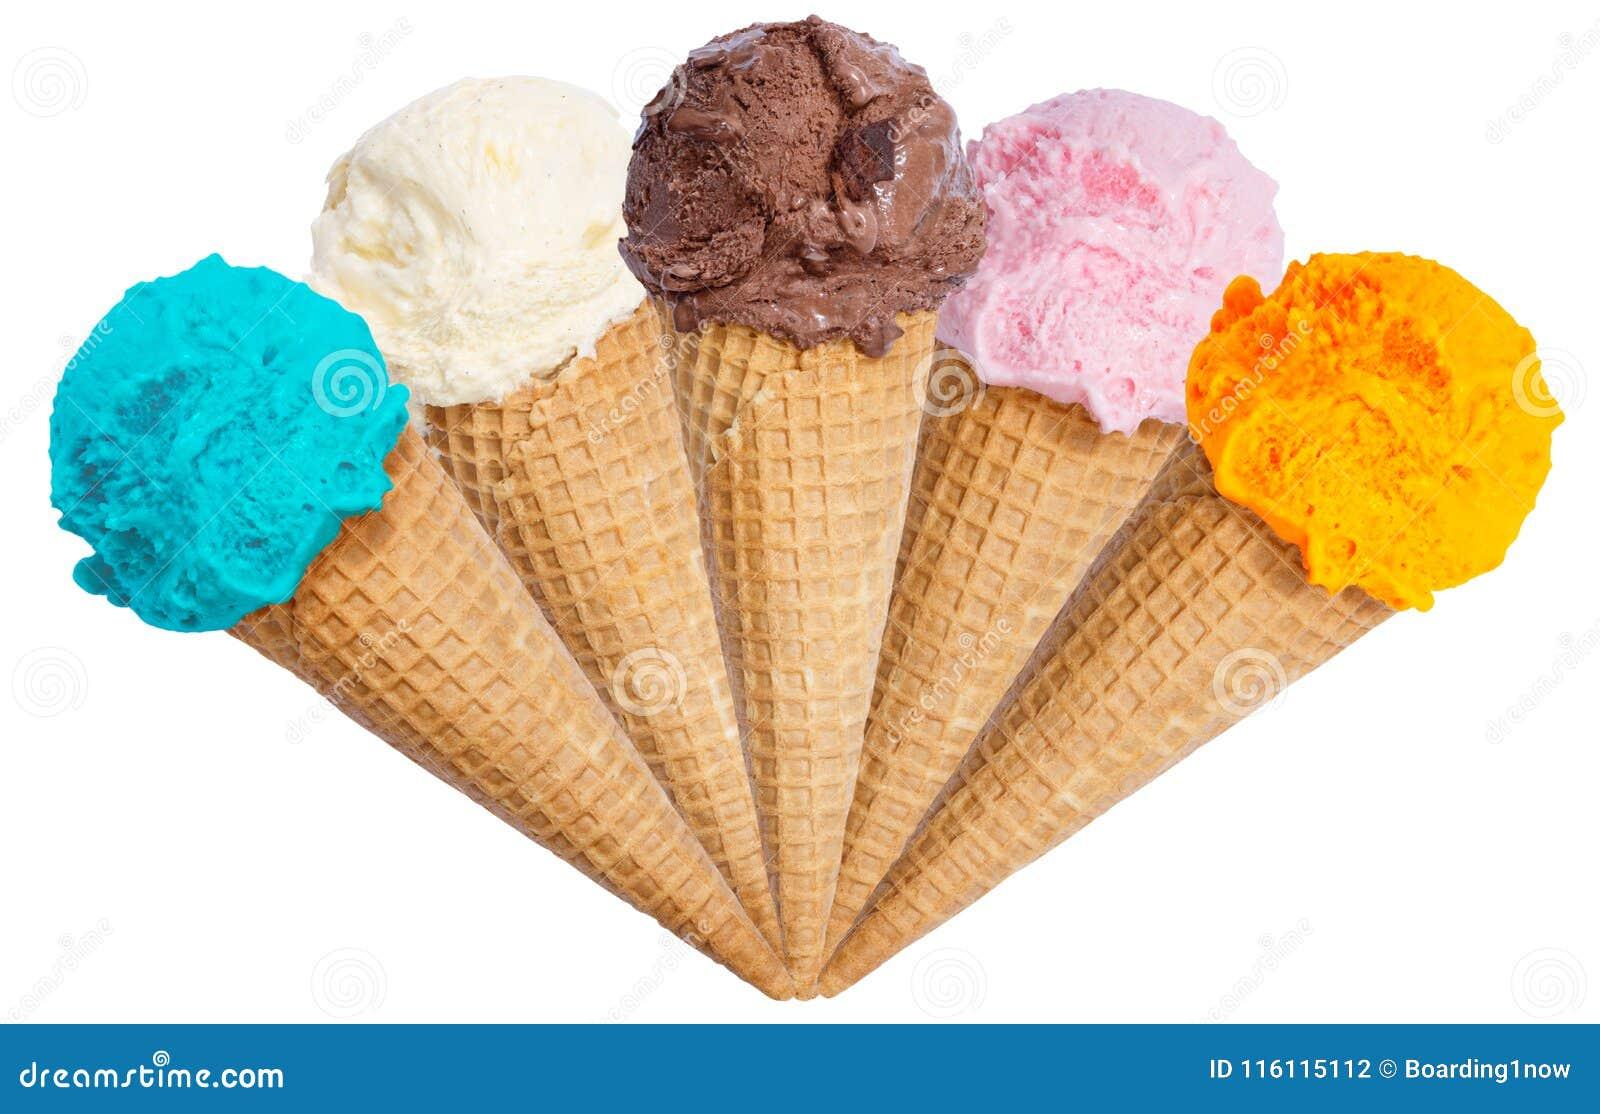 Collection of ice cream scoop sundae cone icecream isolated on w